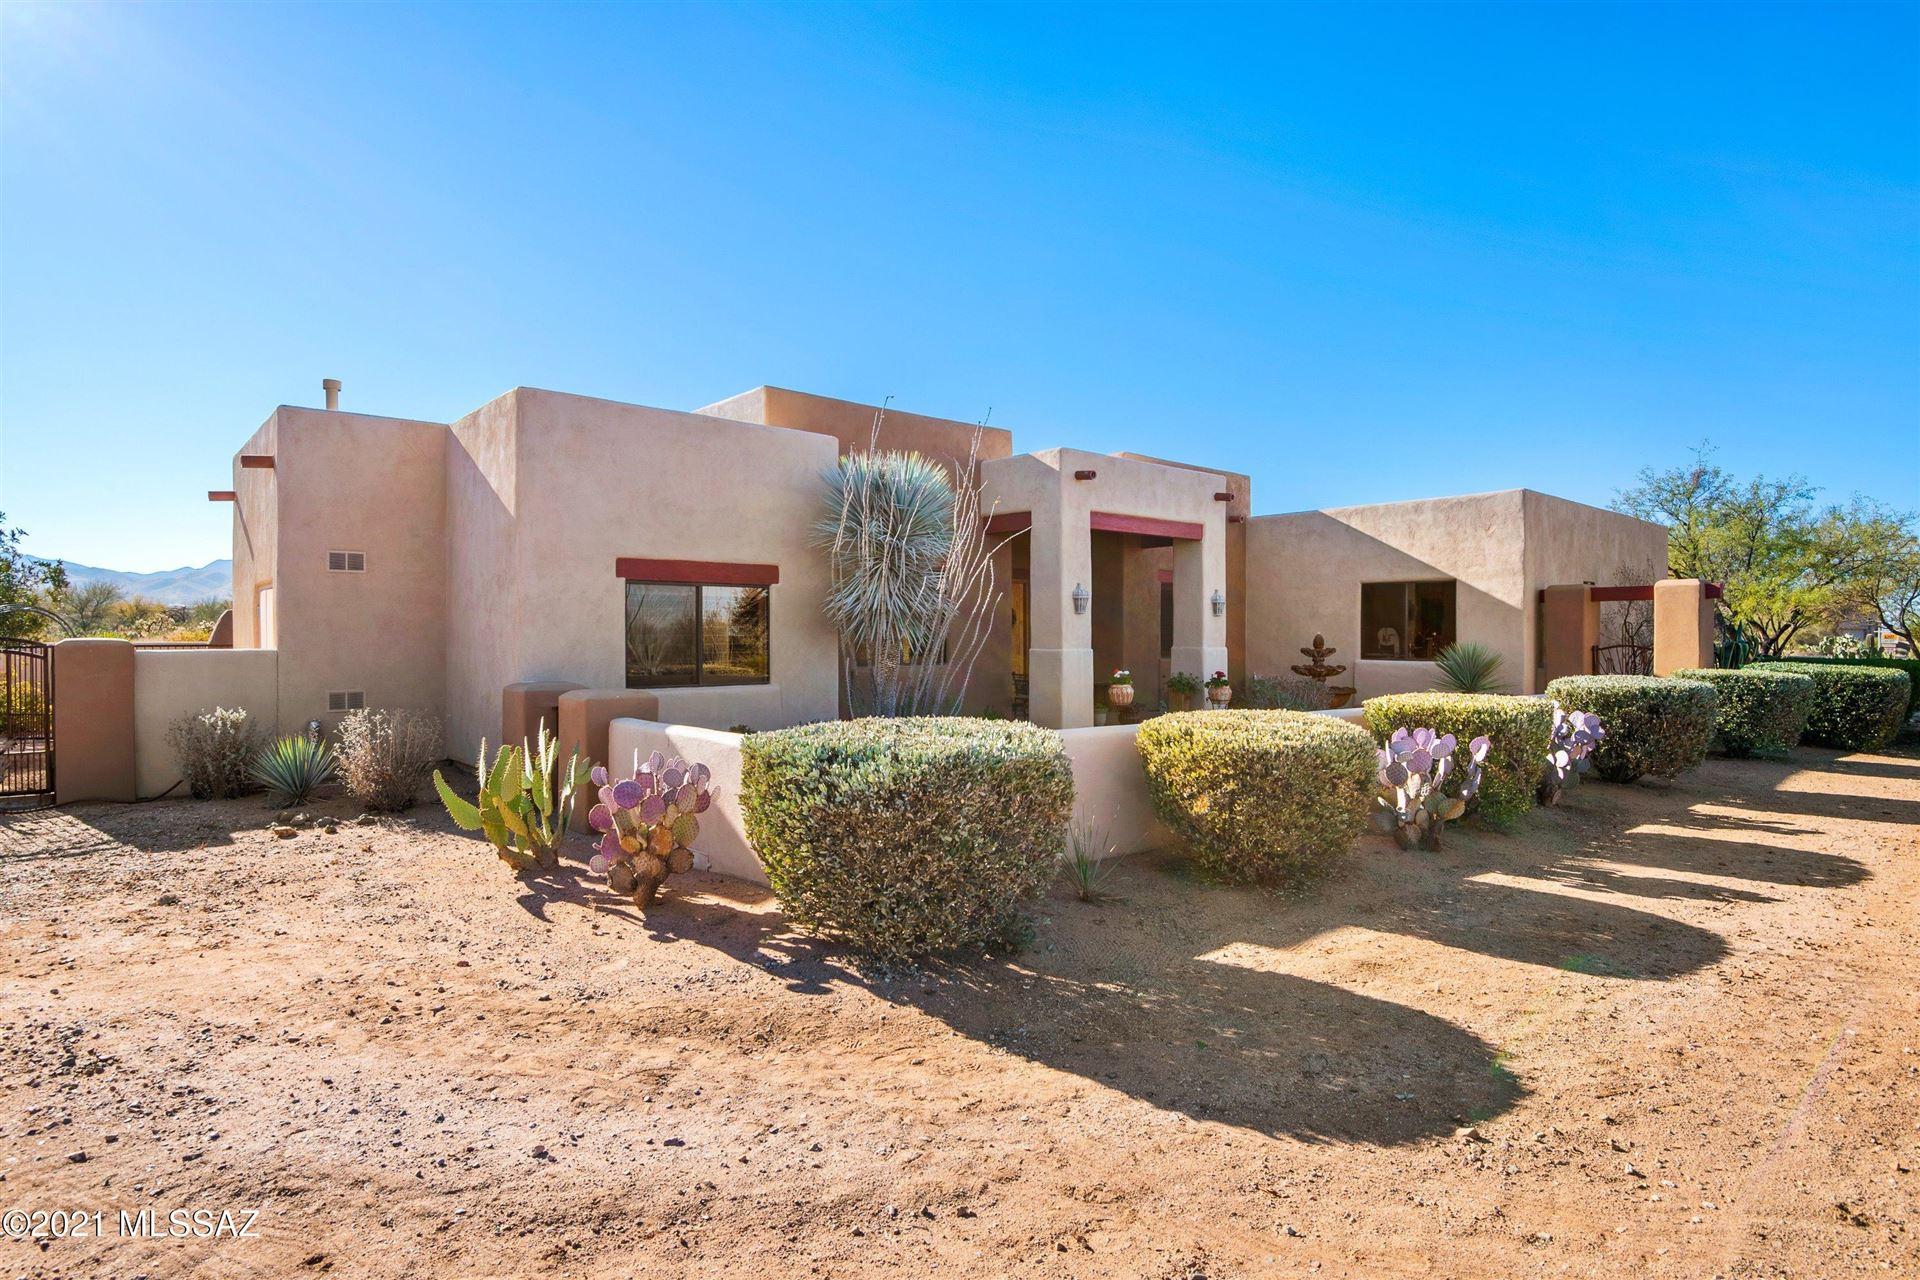 9449 E Barrel Springs Place, Vail, AZ 85641 - MLS#: 22100578